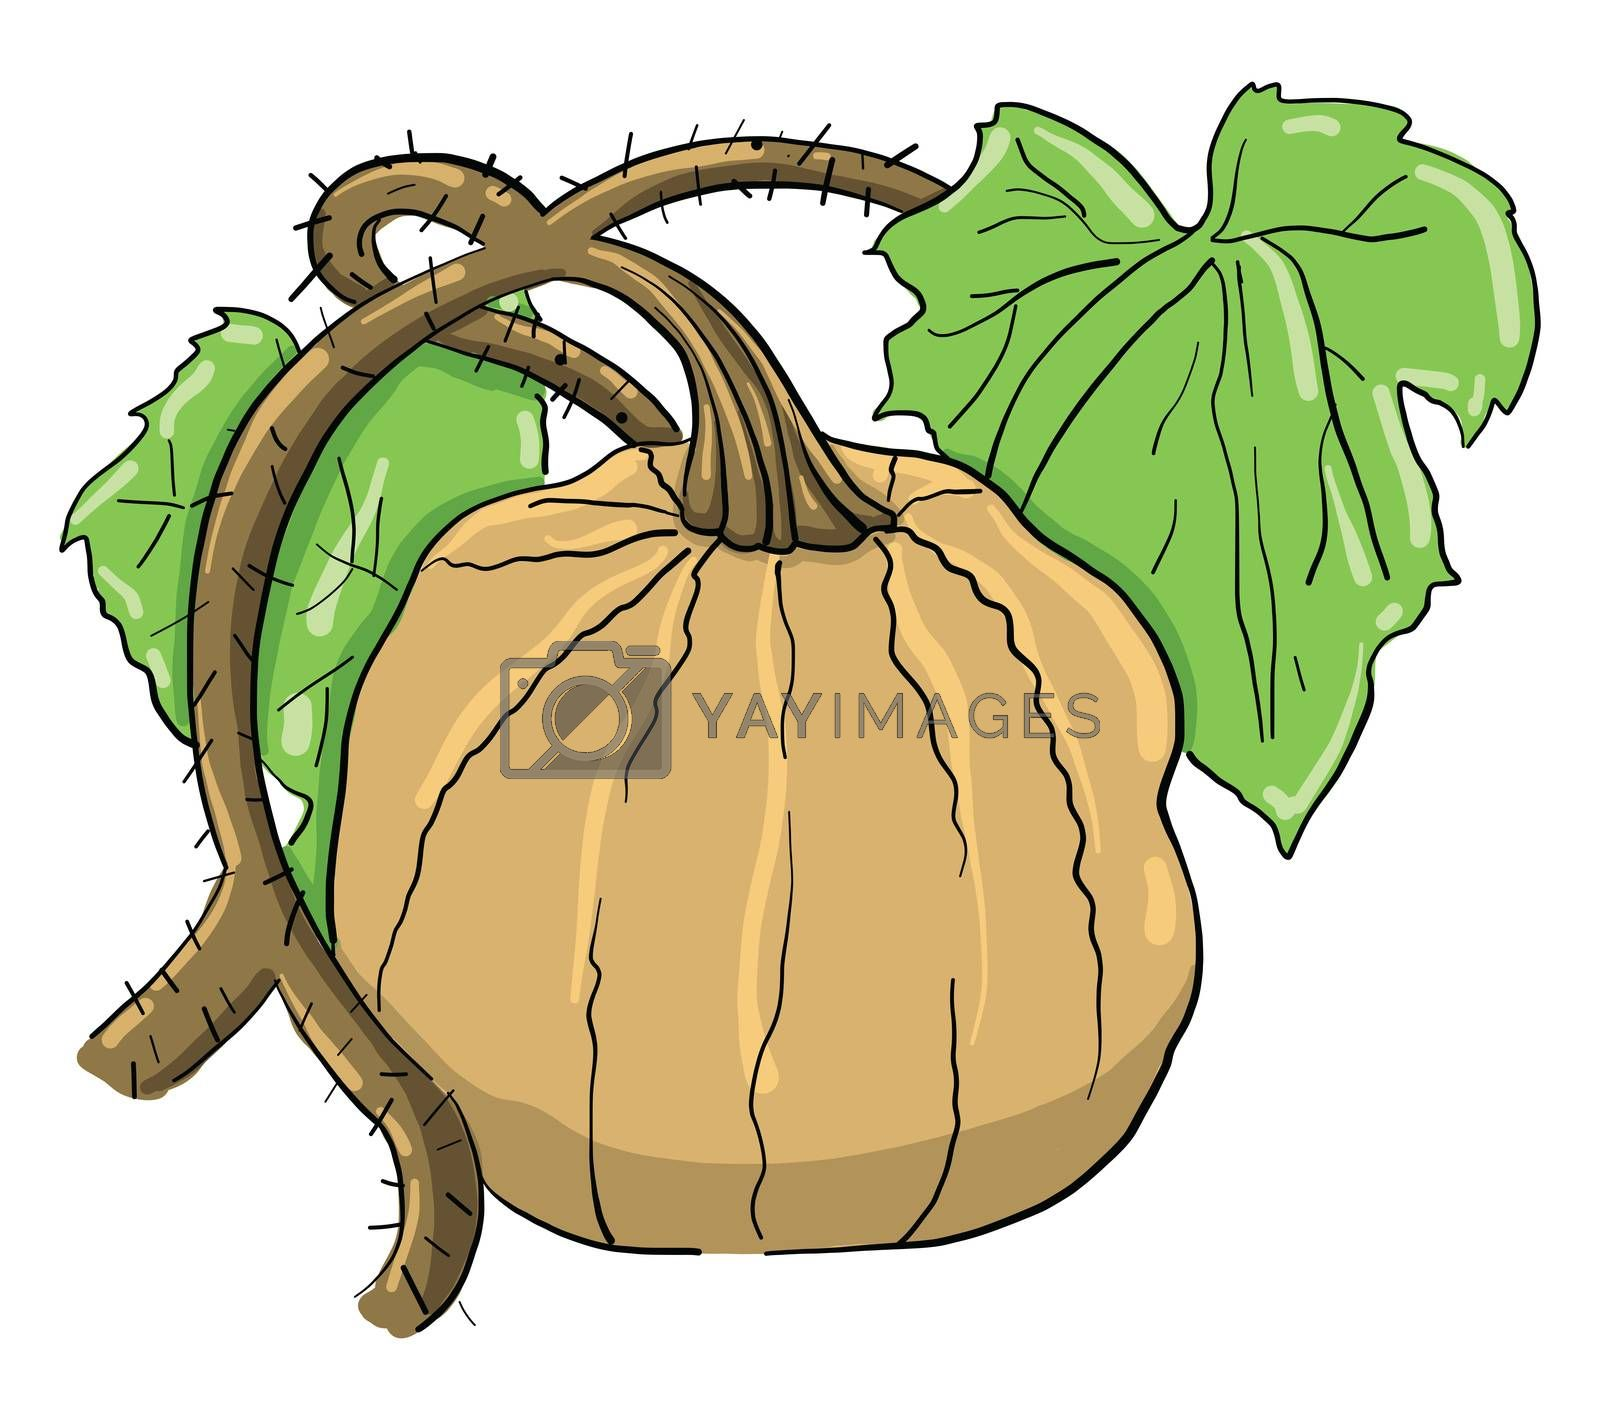 Big pumpkin , illustration, vector on white background